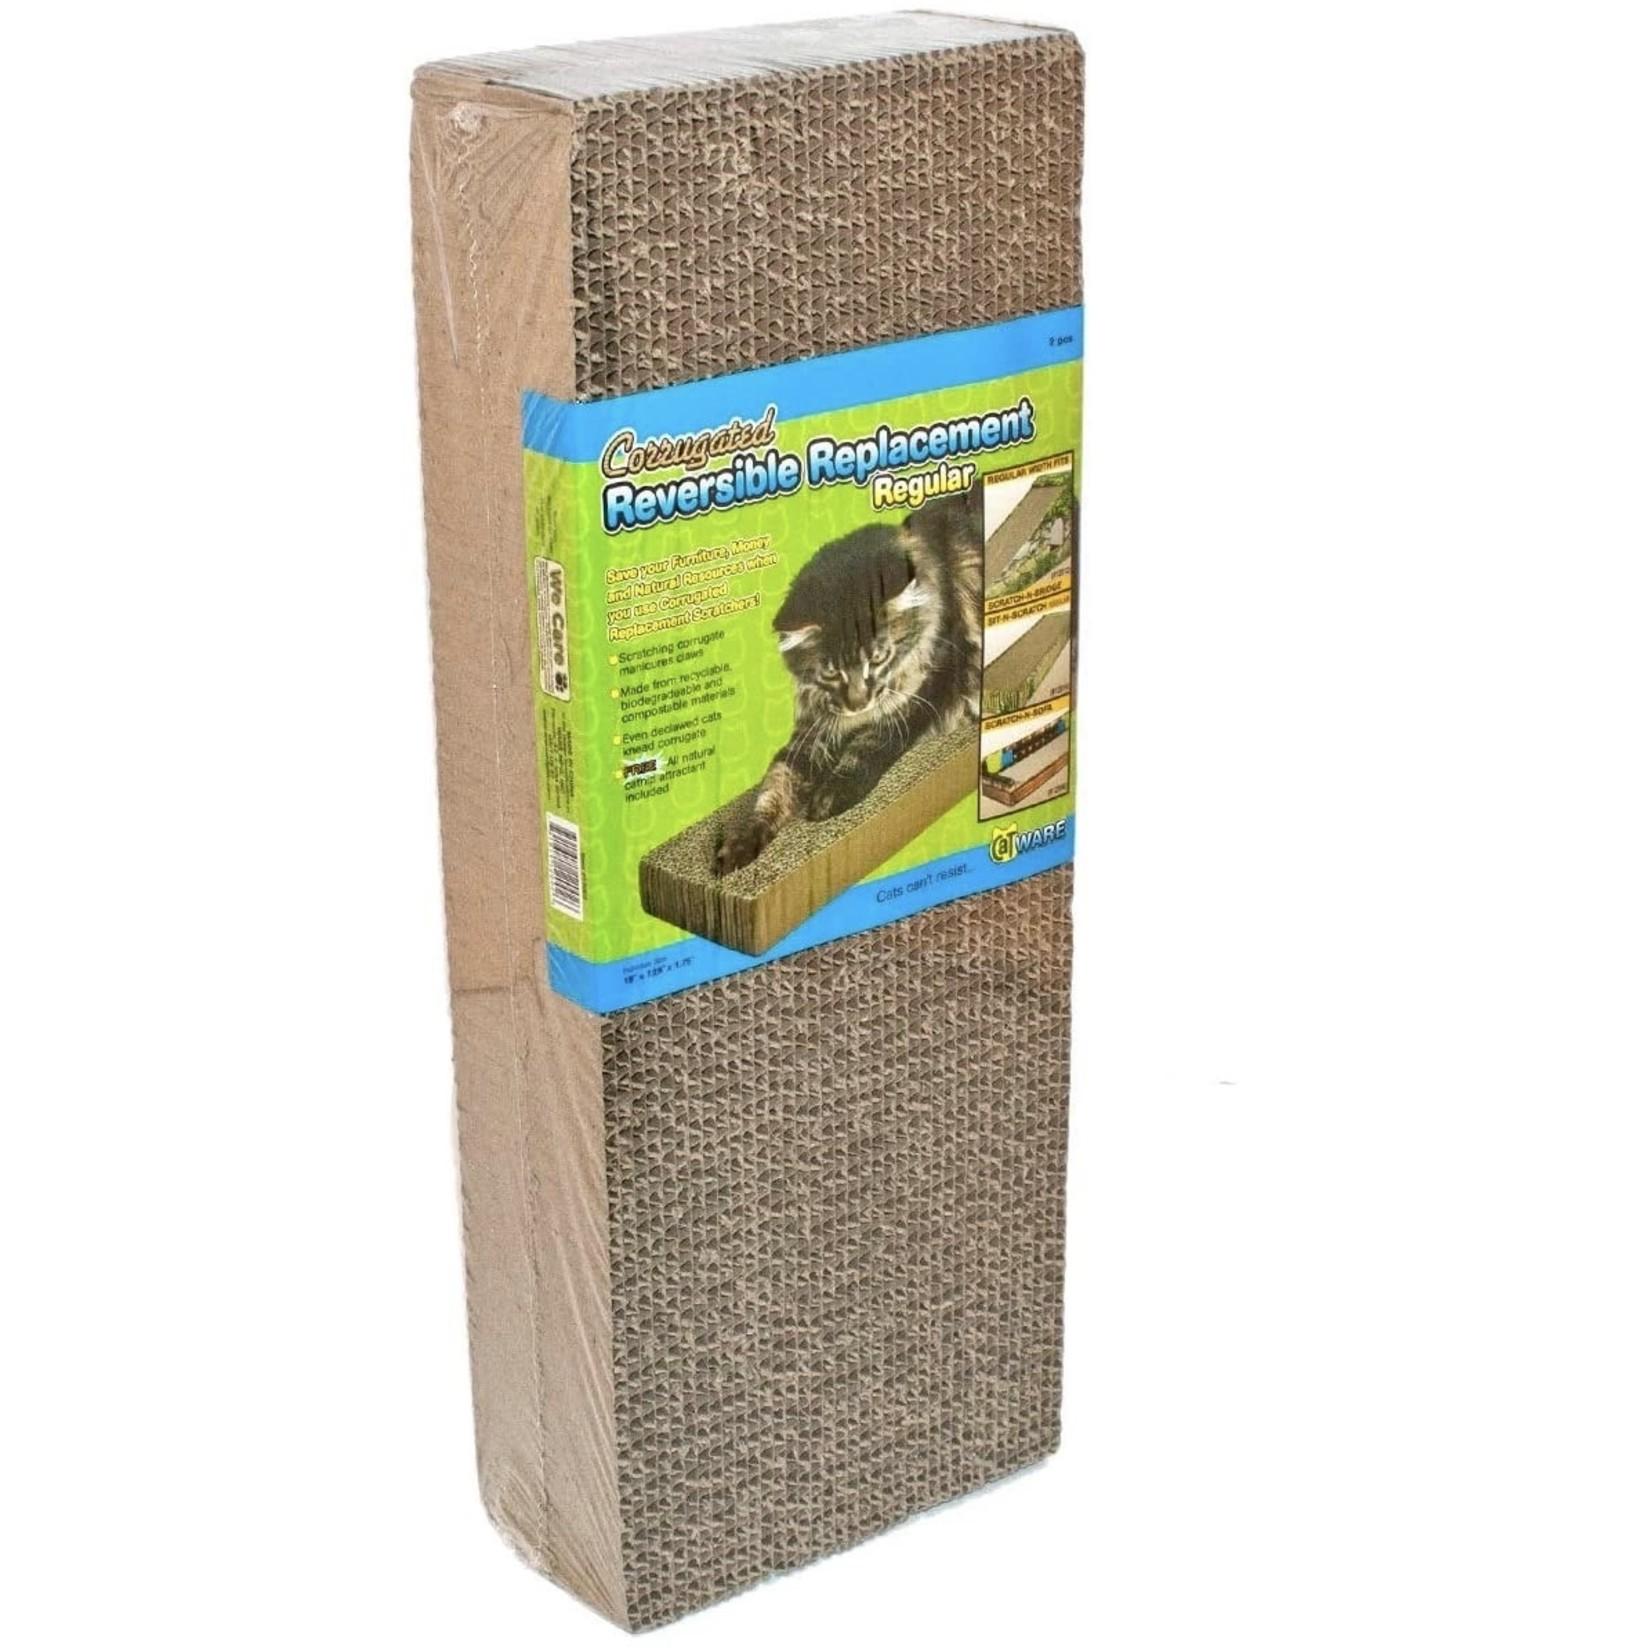 Cat Scratchy Corrugated Reversible Replacement +Catnip Regular  2 pcs